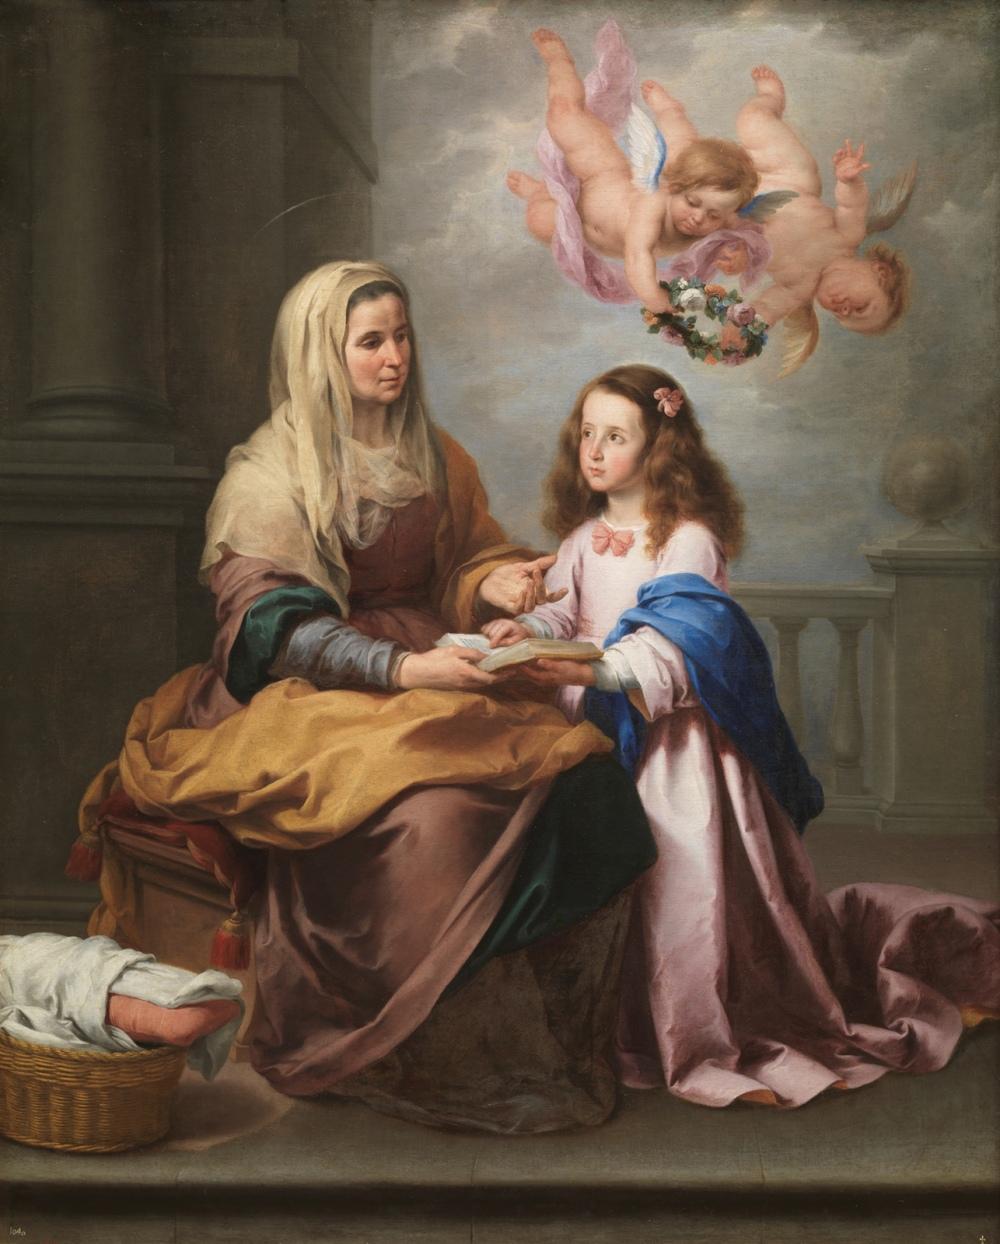 Bartolomé Esteban Murillo. Santa Ana enseñando a leer a la Virgen. 1655. Museo Nacional del Prado.